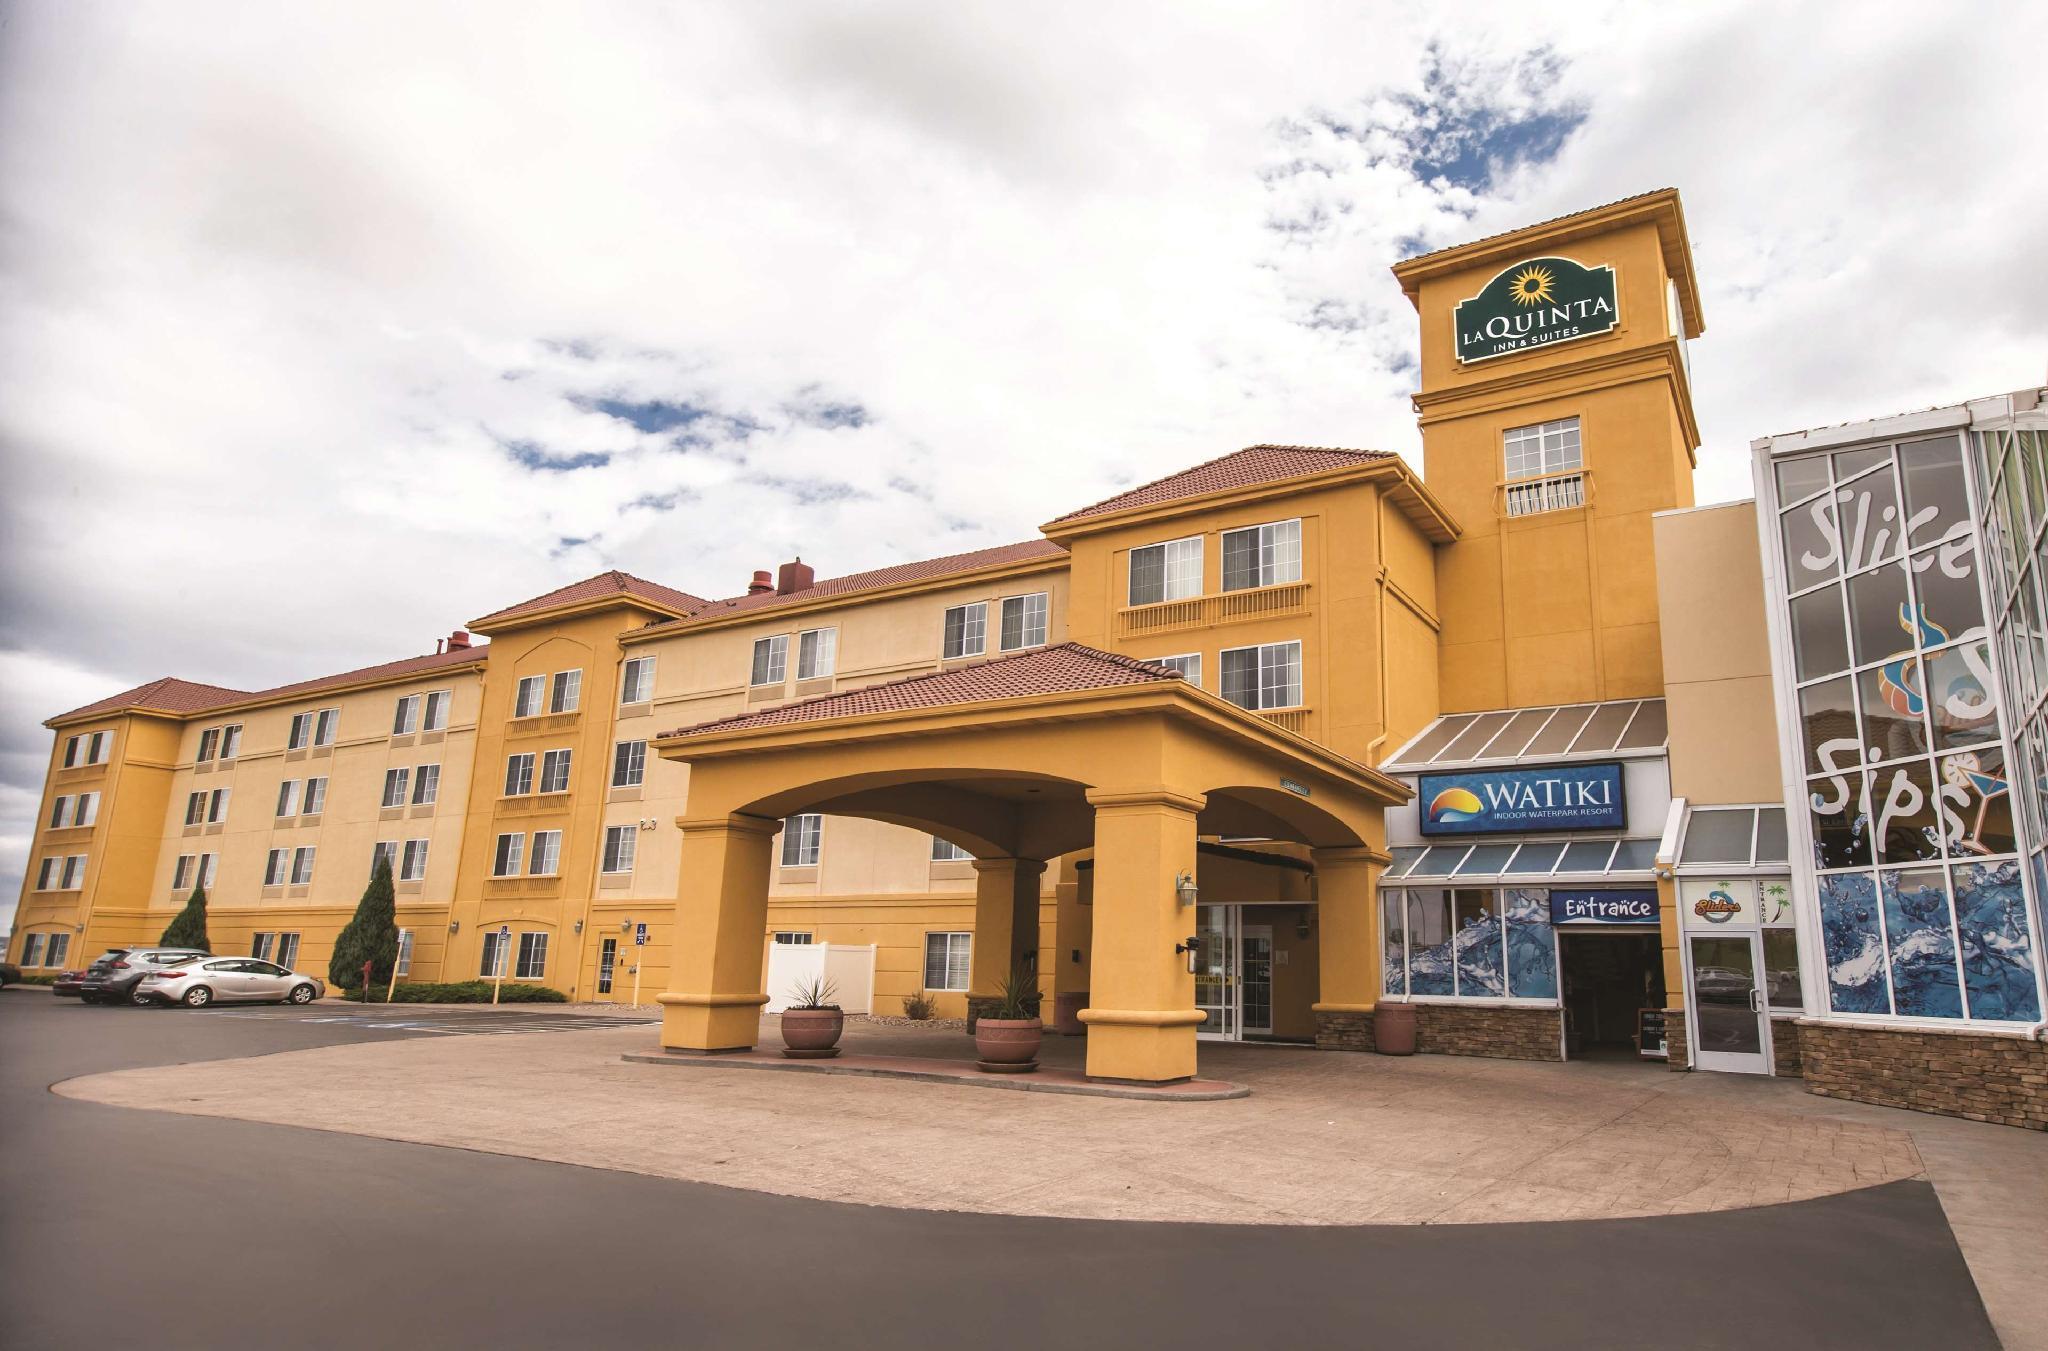 La Quinta Inn And Suites By Wyndham Rapid City